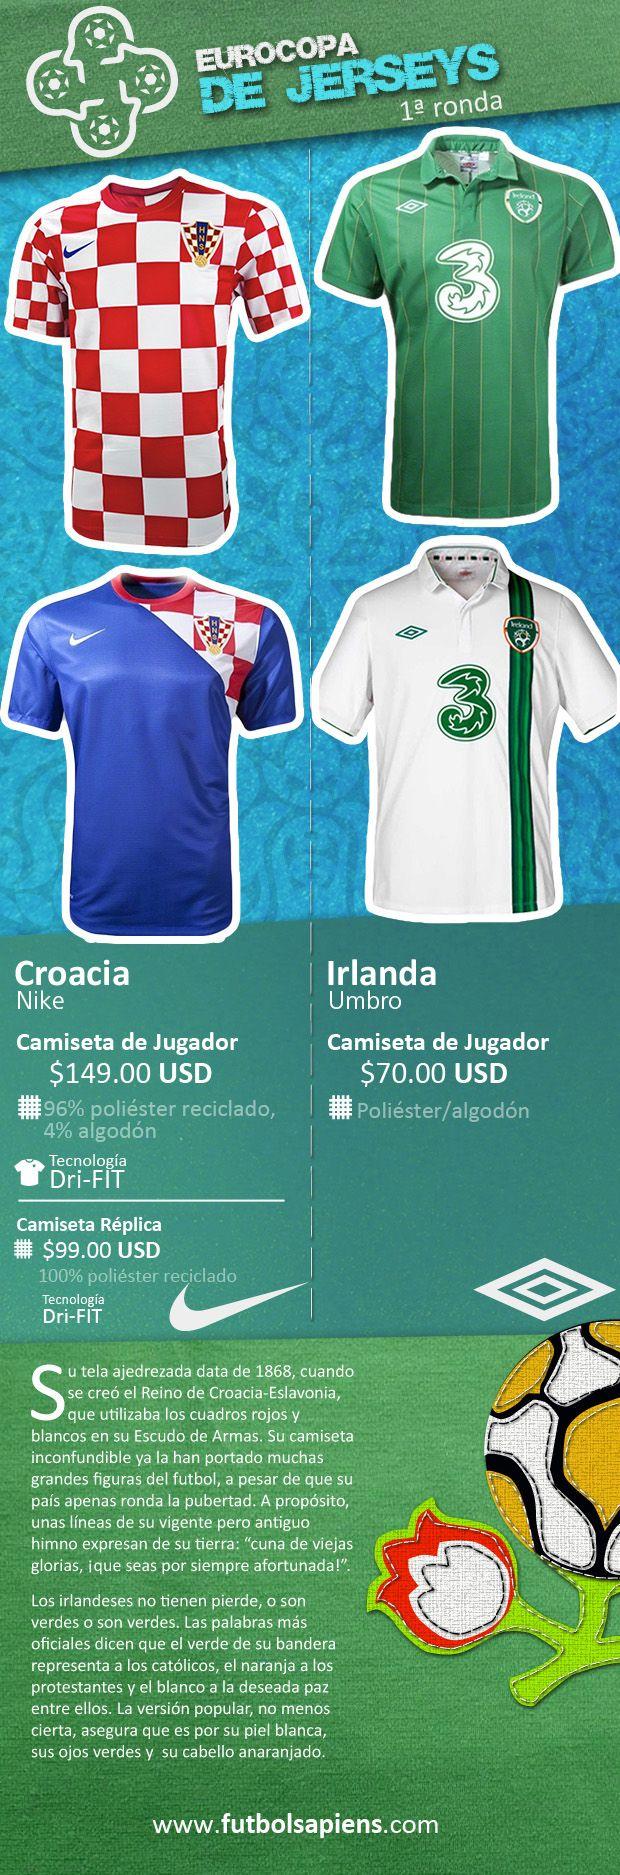 Duelo #6 Croacia vs Irlanda